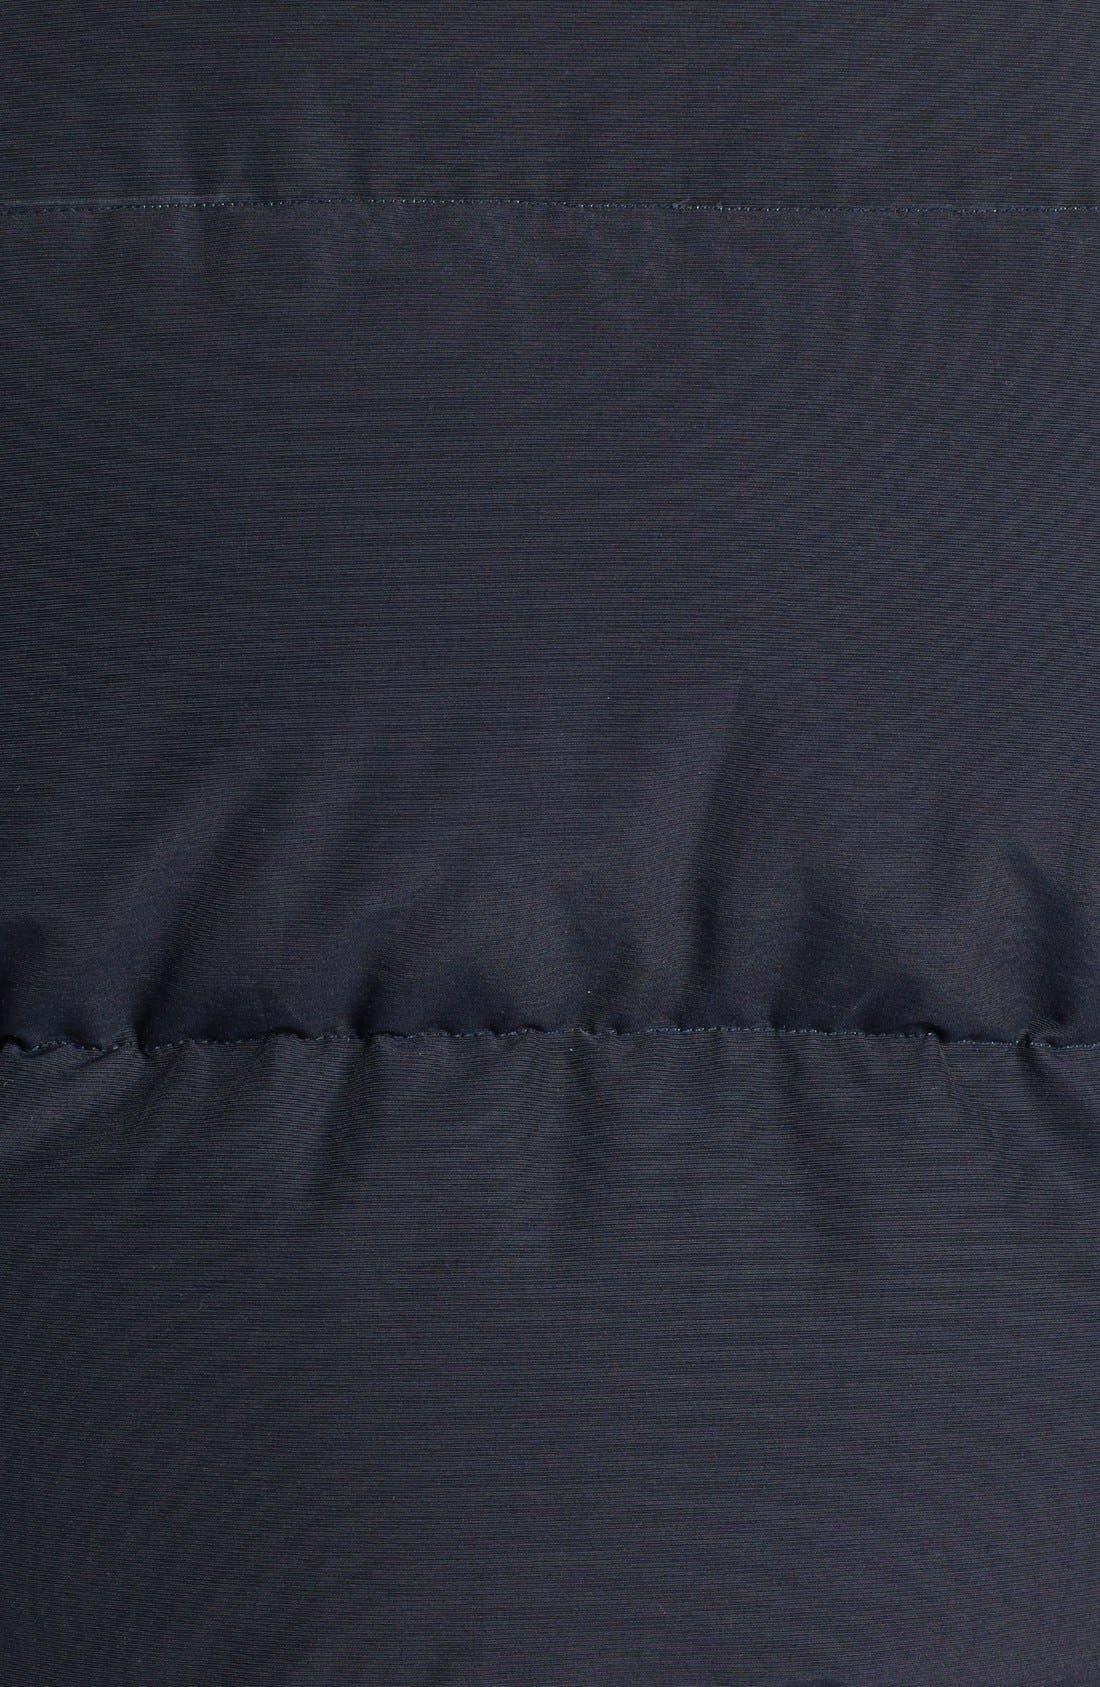 Alternate Image 3  - Penfield 'Outback' Down Vest